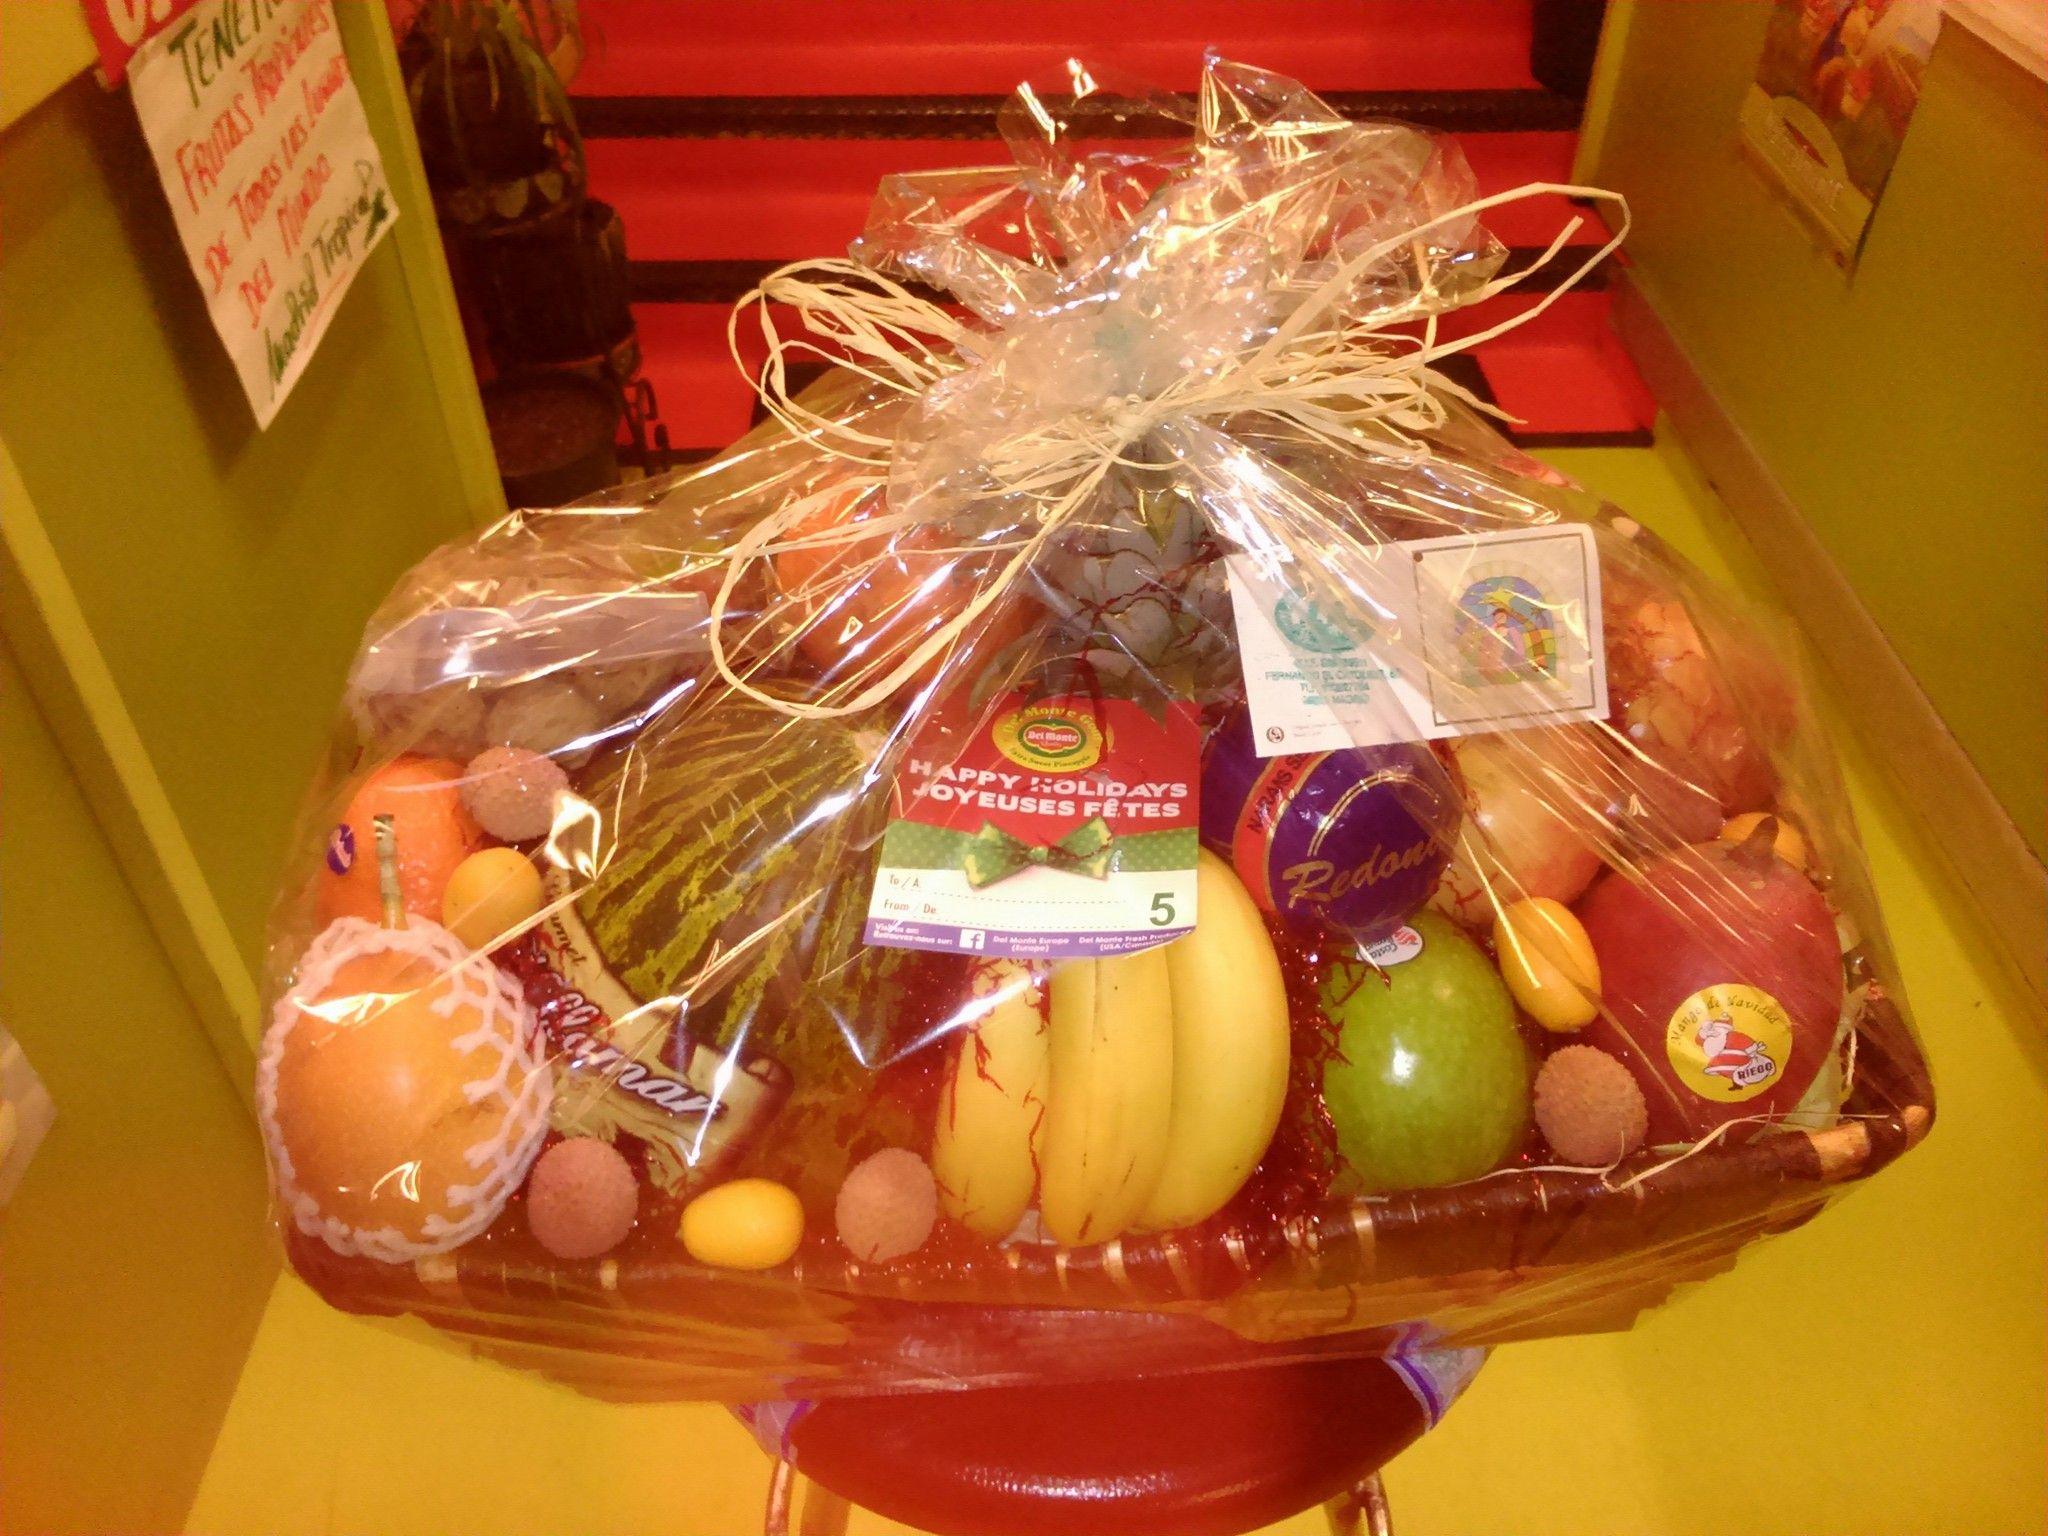 Cestas de frutas originales en Argüelles, Moncloa